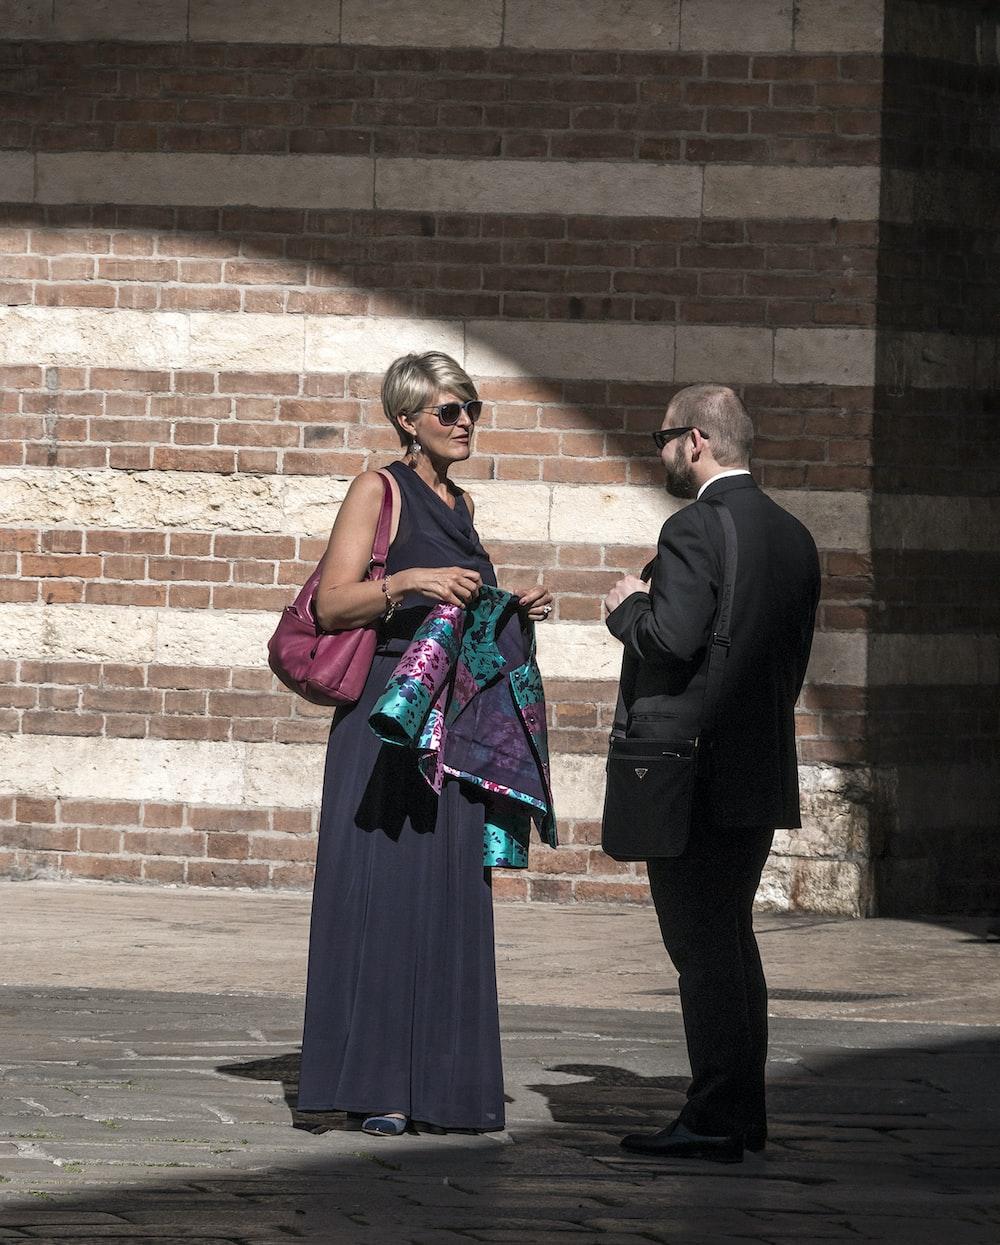 man in black suit standing beside woman in black dress